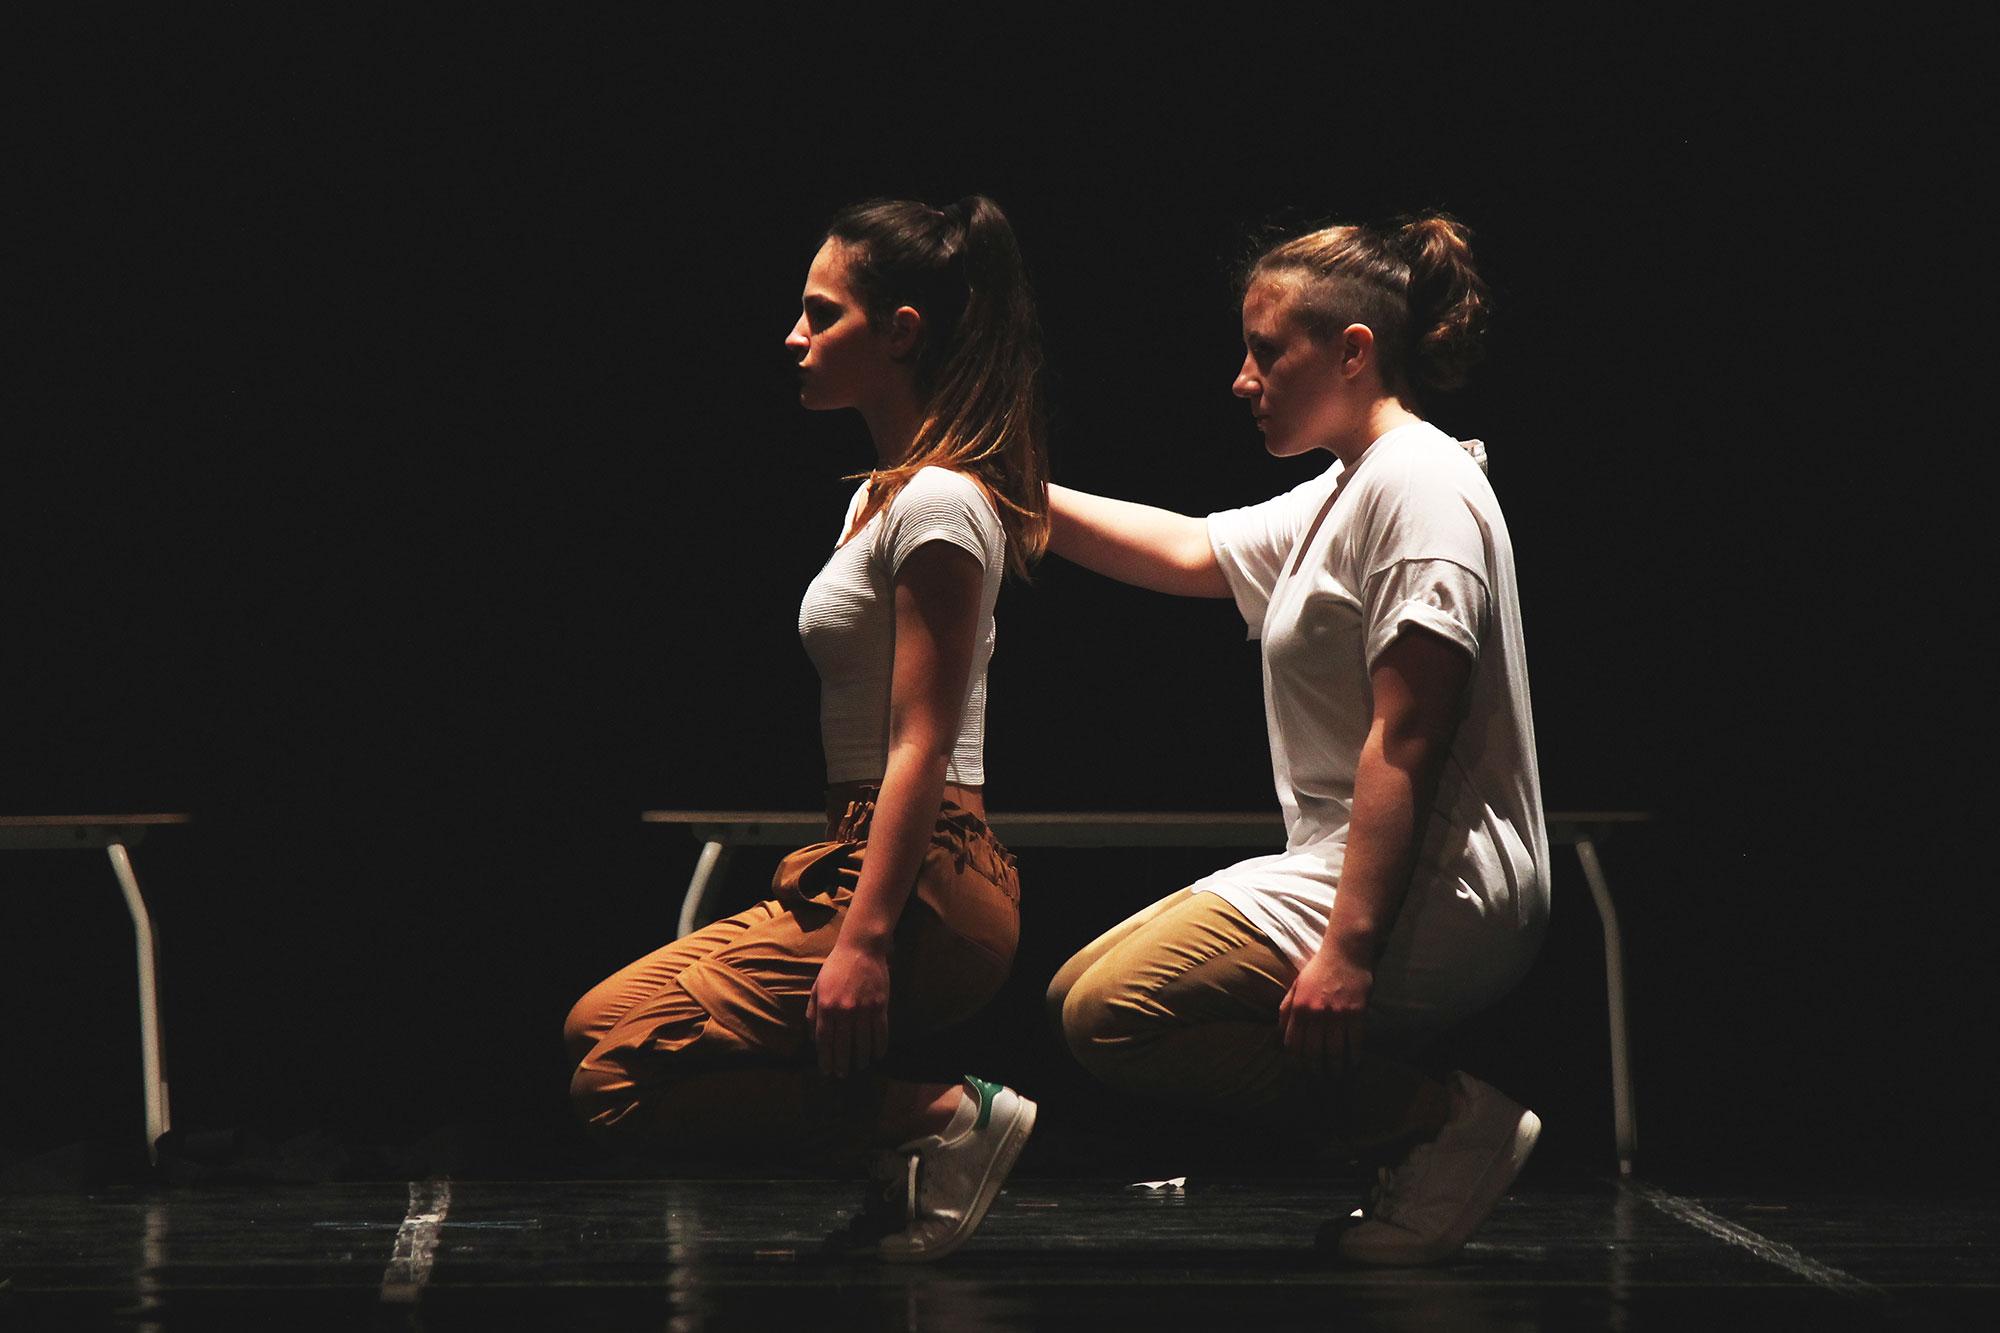 Round Trip | Teatro Binario 7 - Monza_18